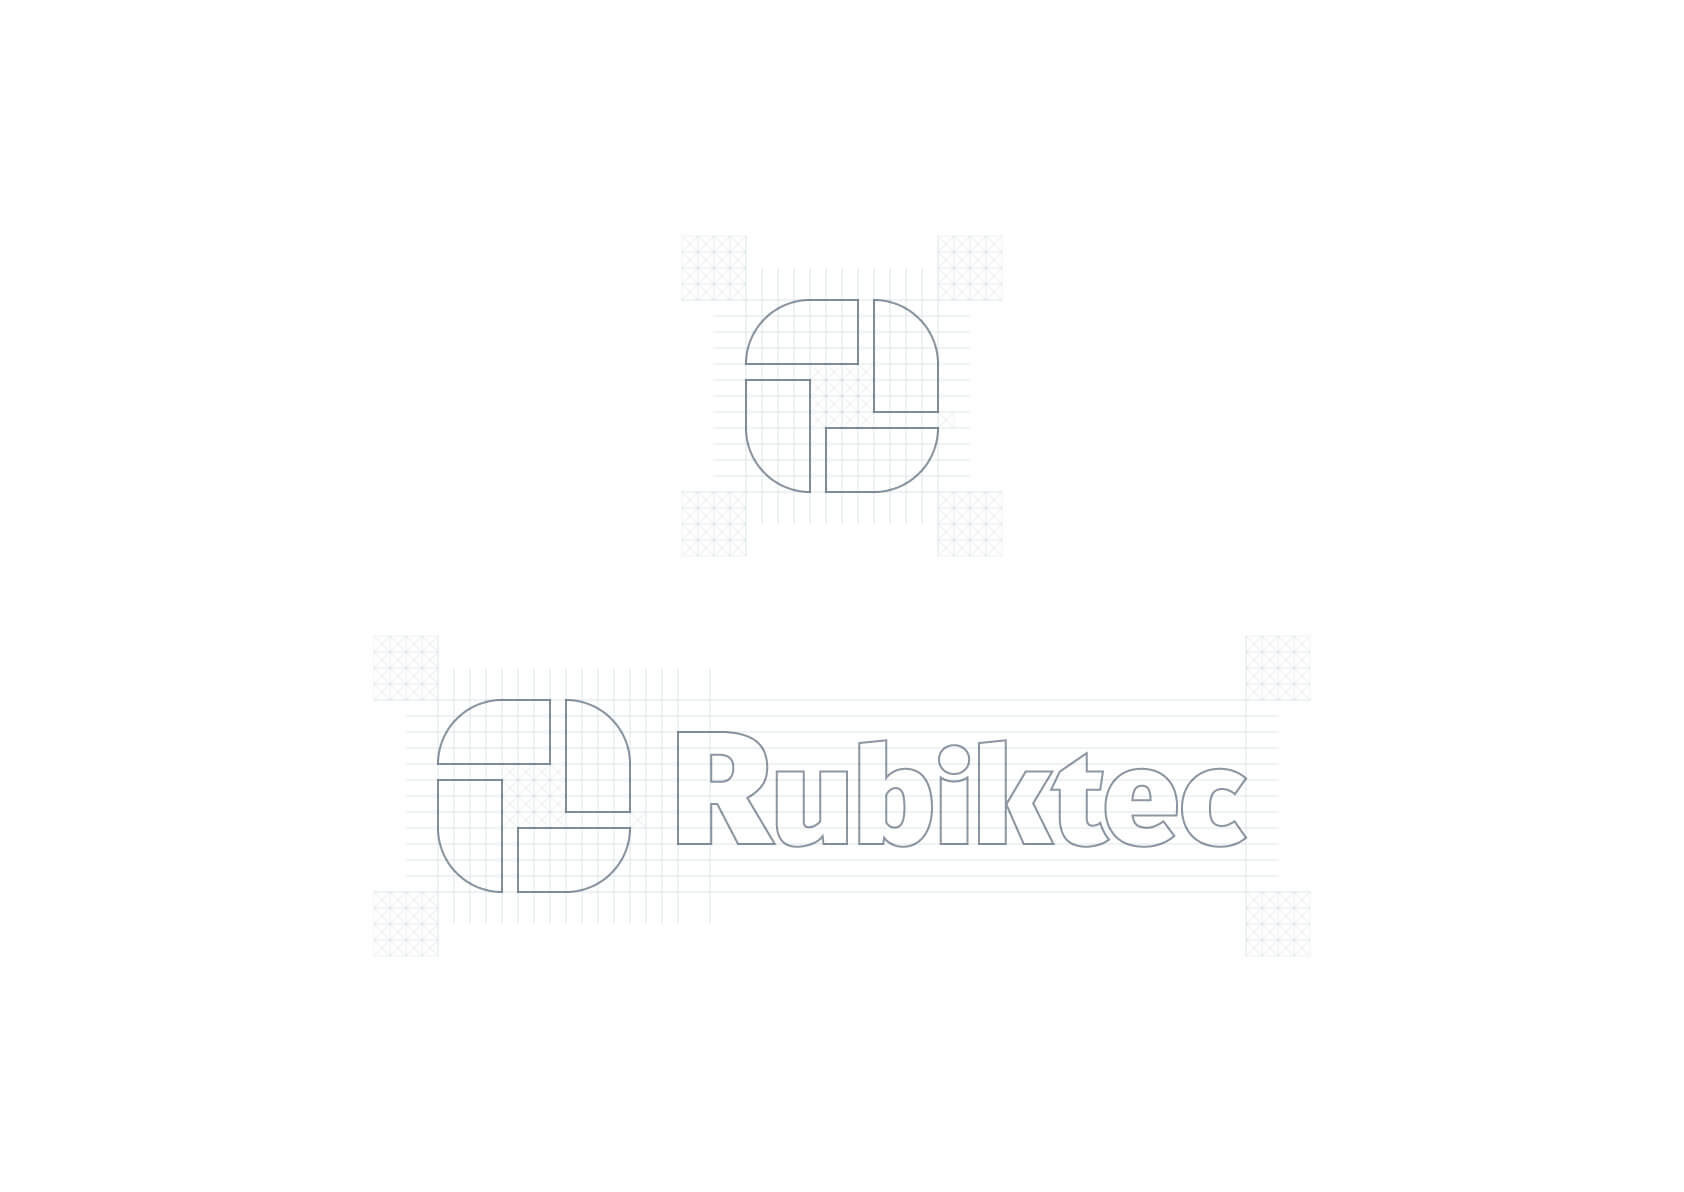 rubiktec-logo-construction